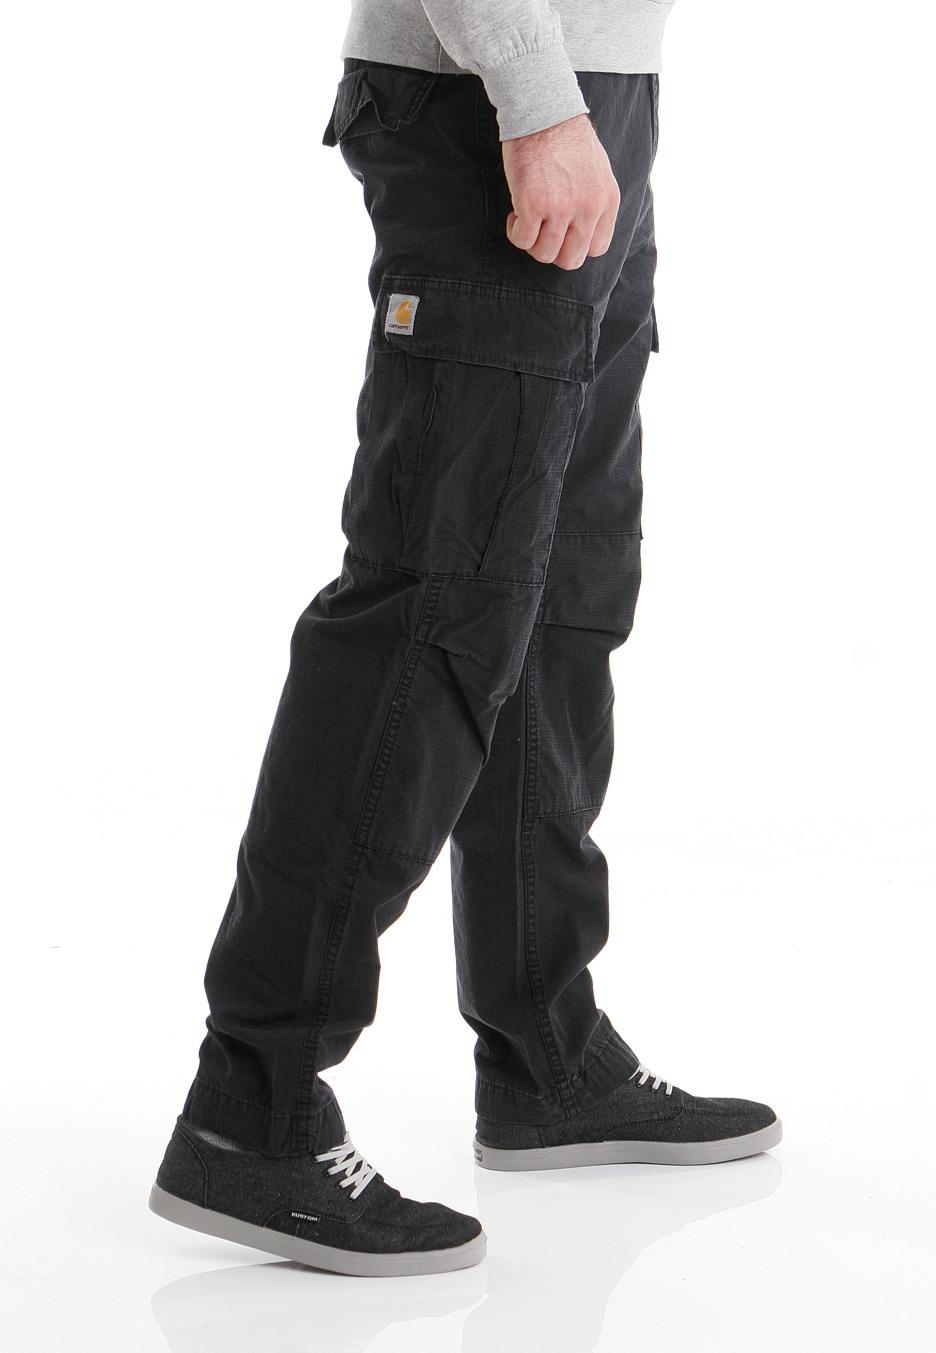 Carhartt WIP - Slim Cargo Columbia Black Stone Washed - Hose - Streetwear Shop - Impericon.com DE